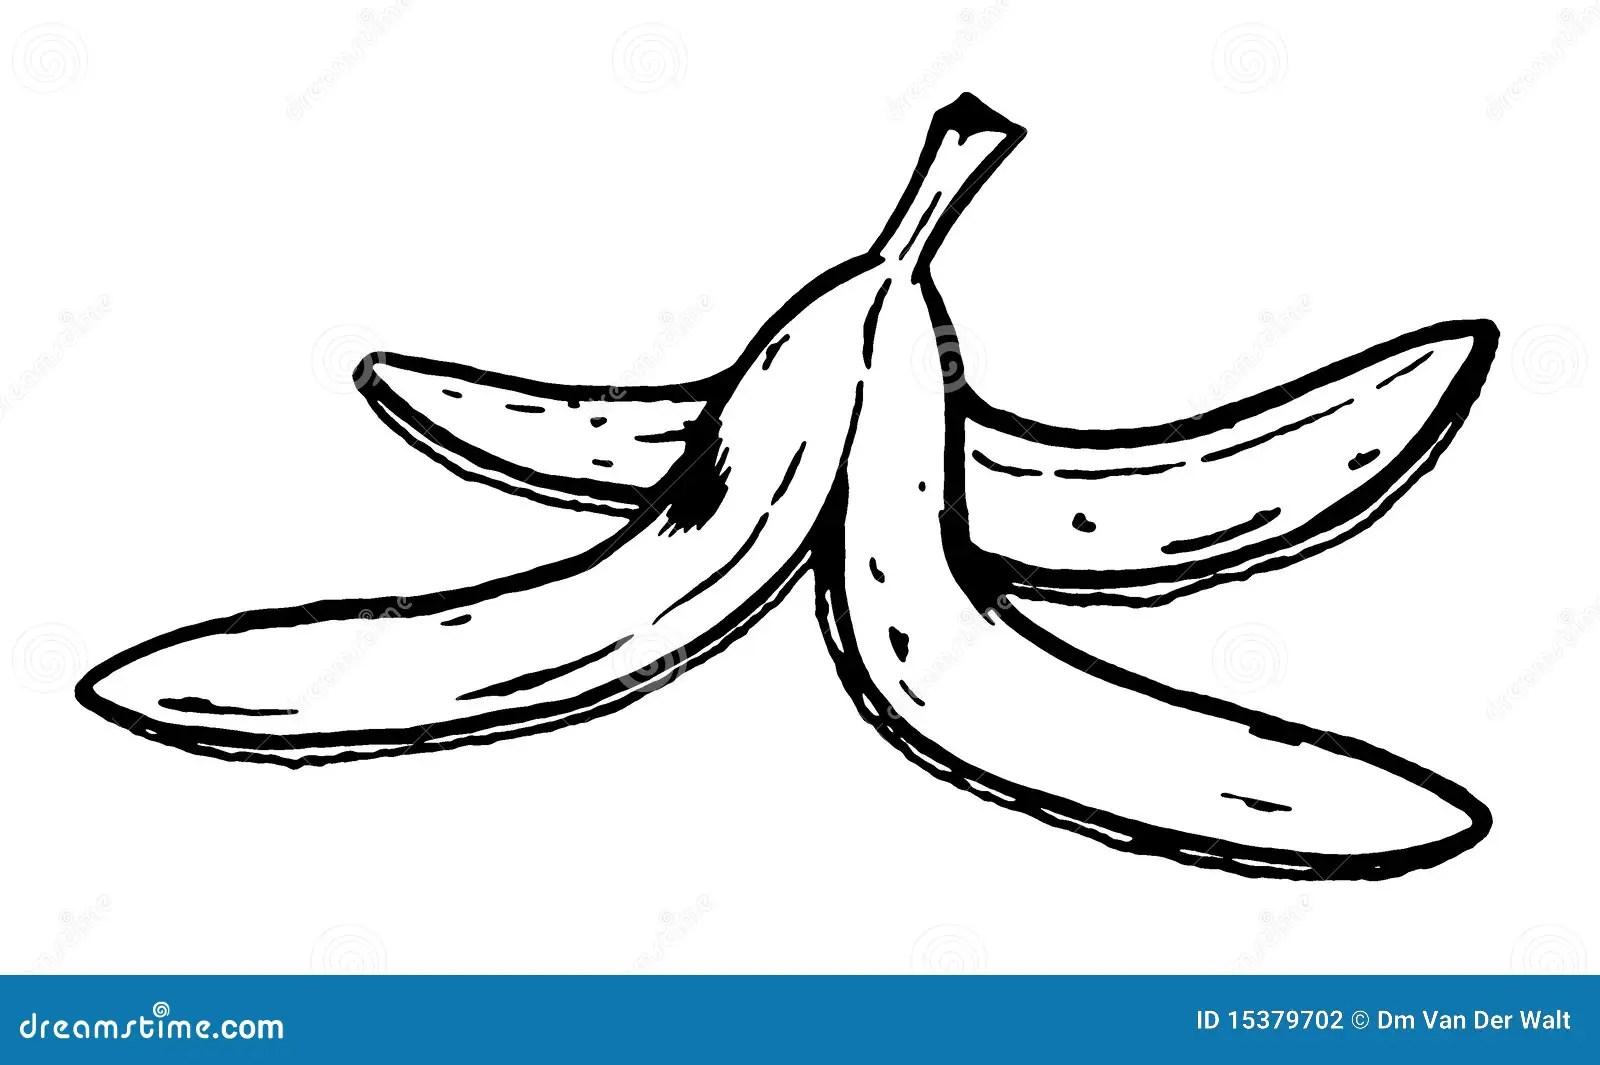 banana skin colouring pages